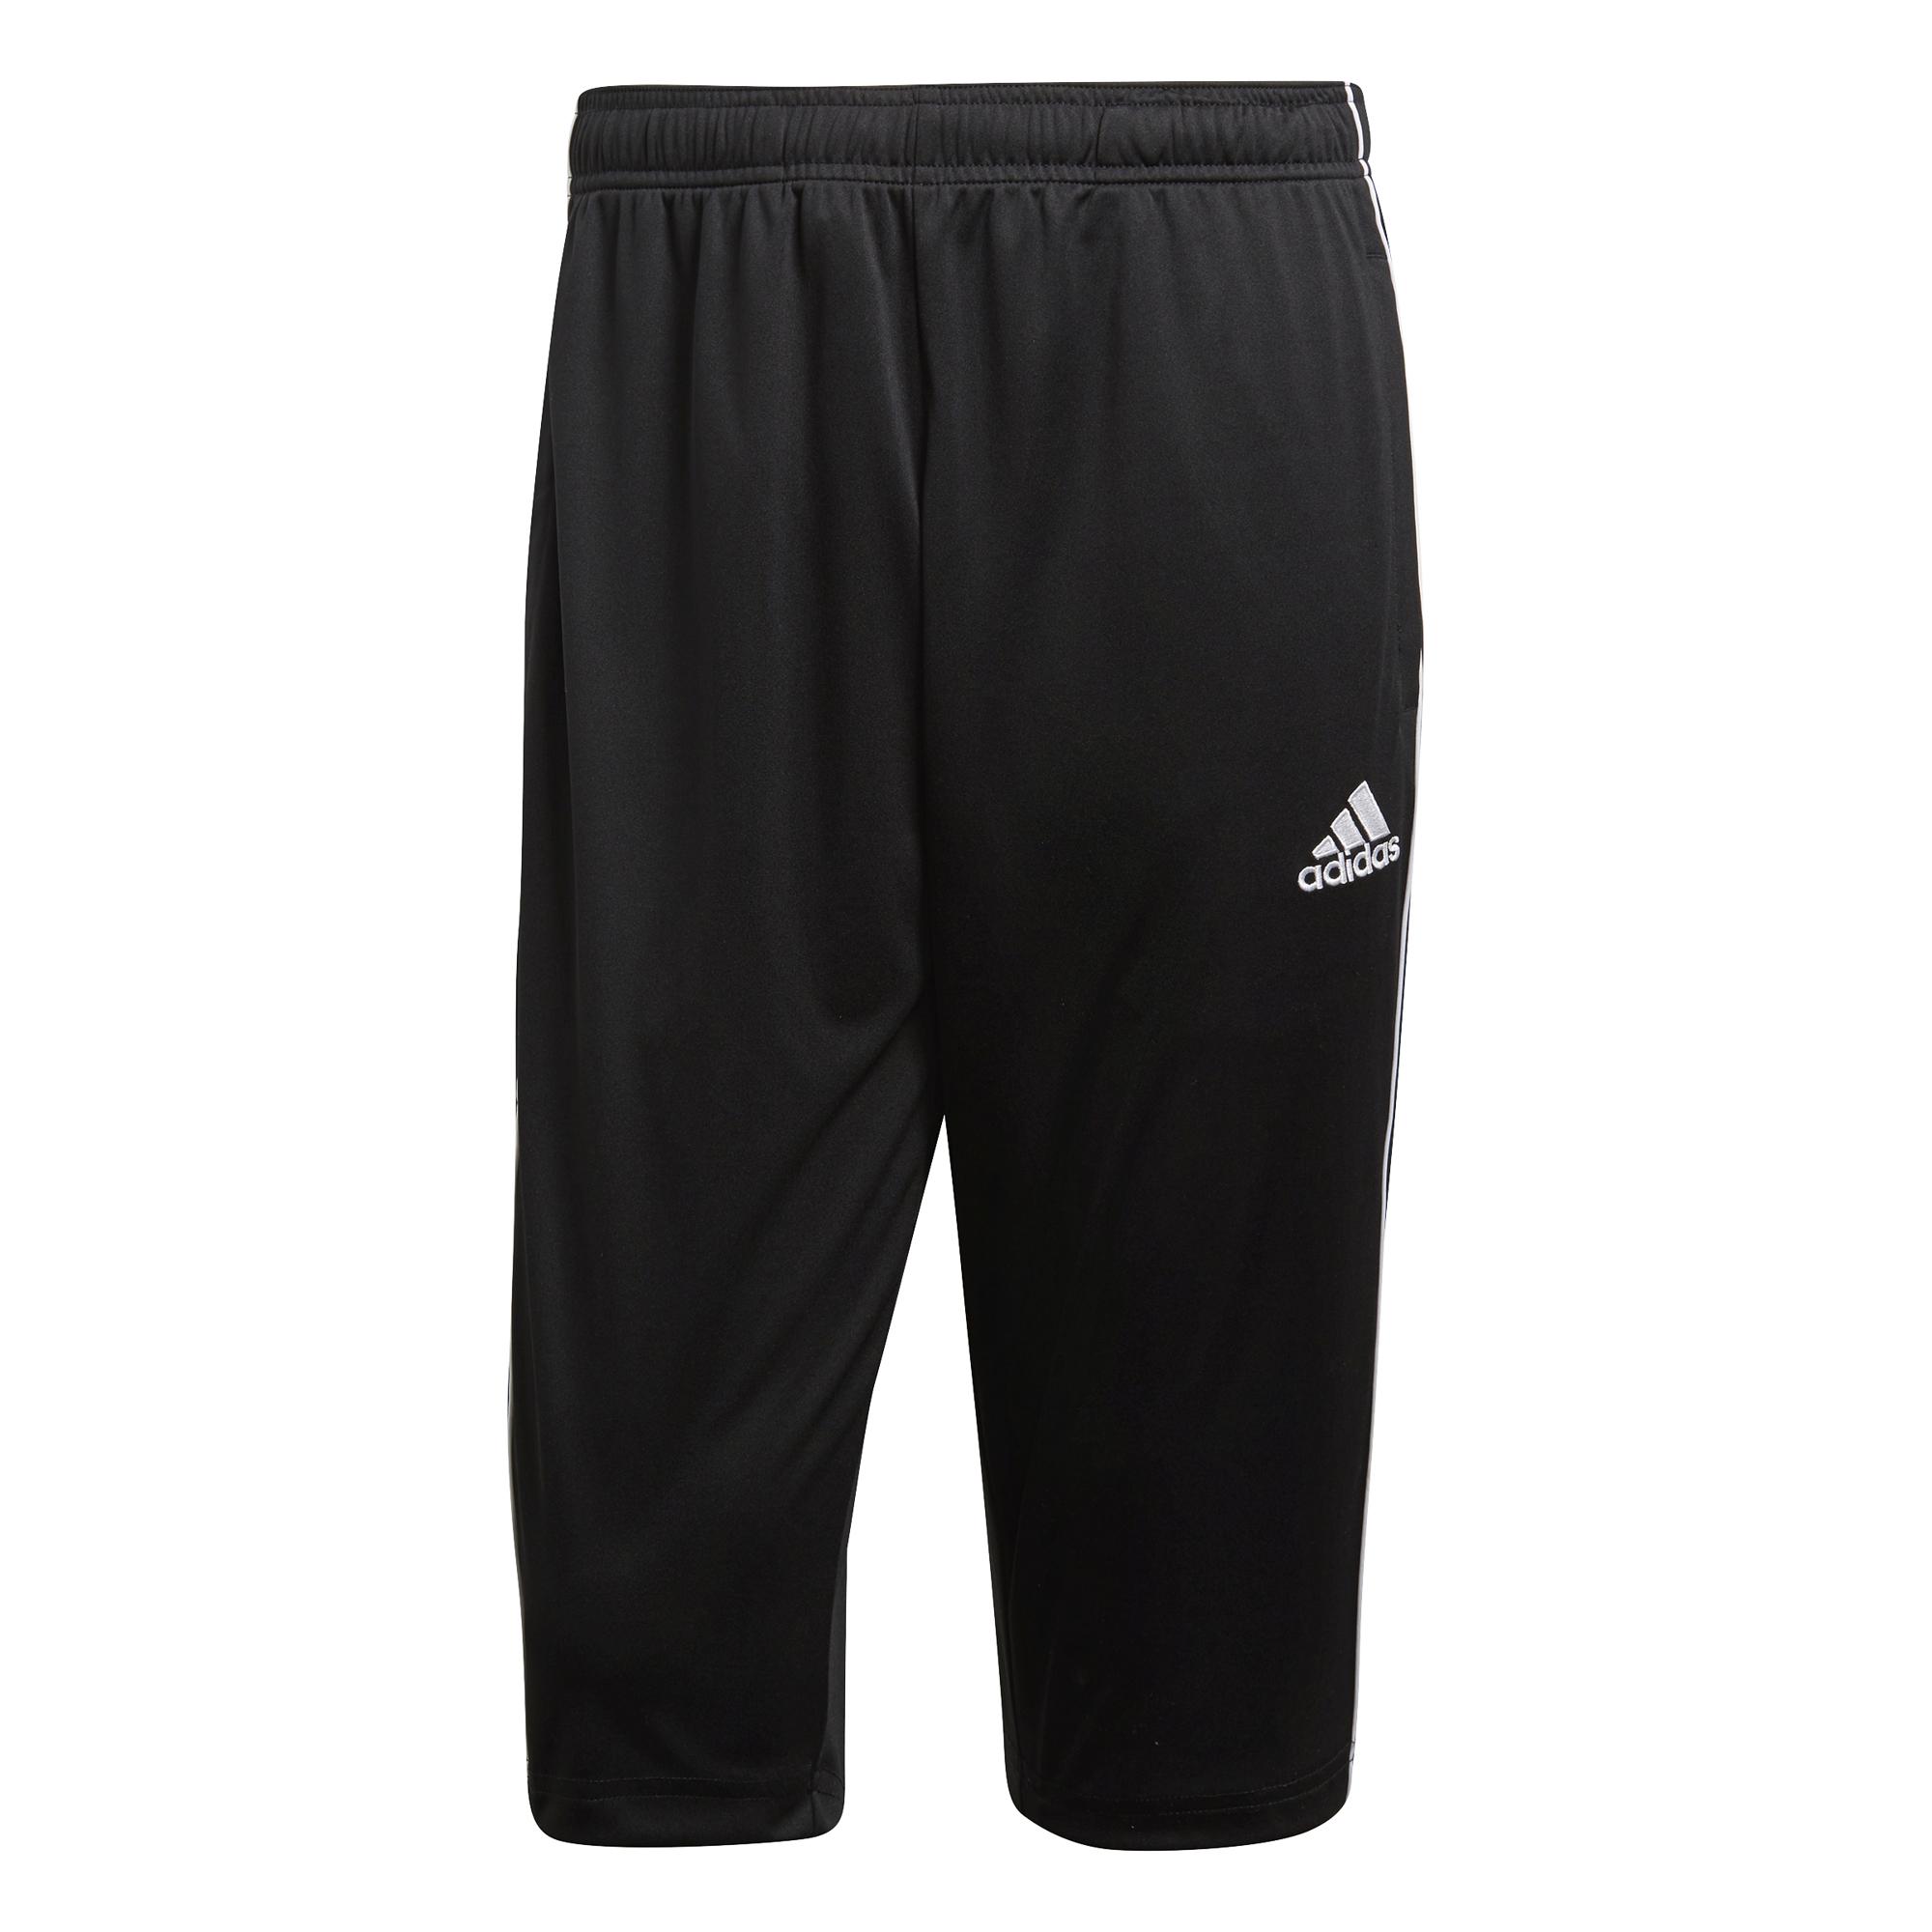 ADIDAS tréninkové 3/4 kalhoty Core 18